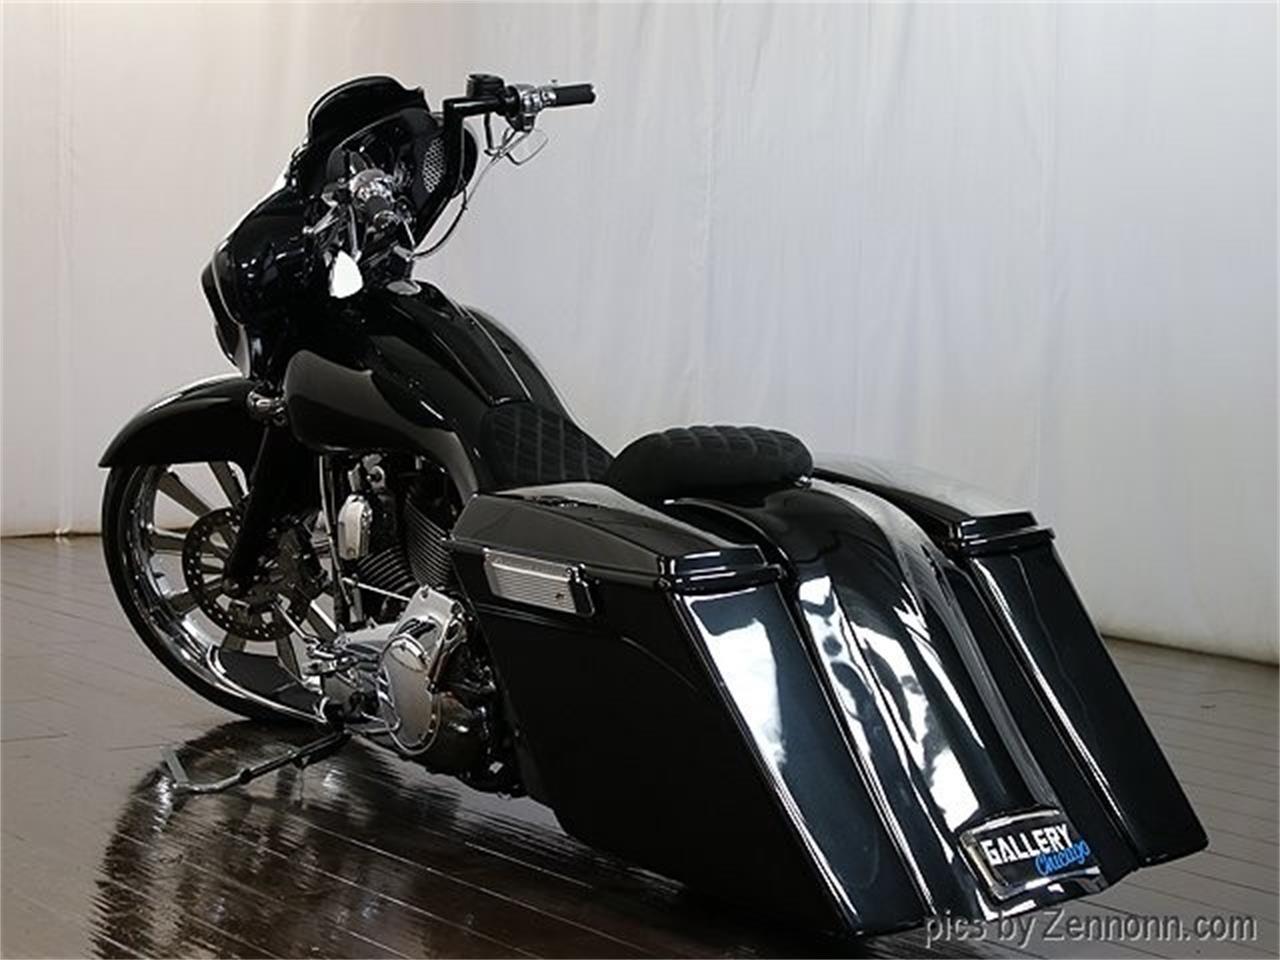 2007 Harley Davidson Street Glide For Sale In Addison Il